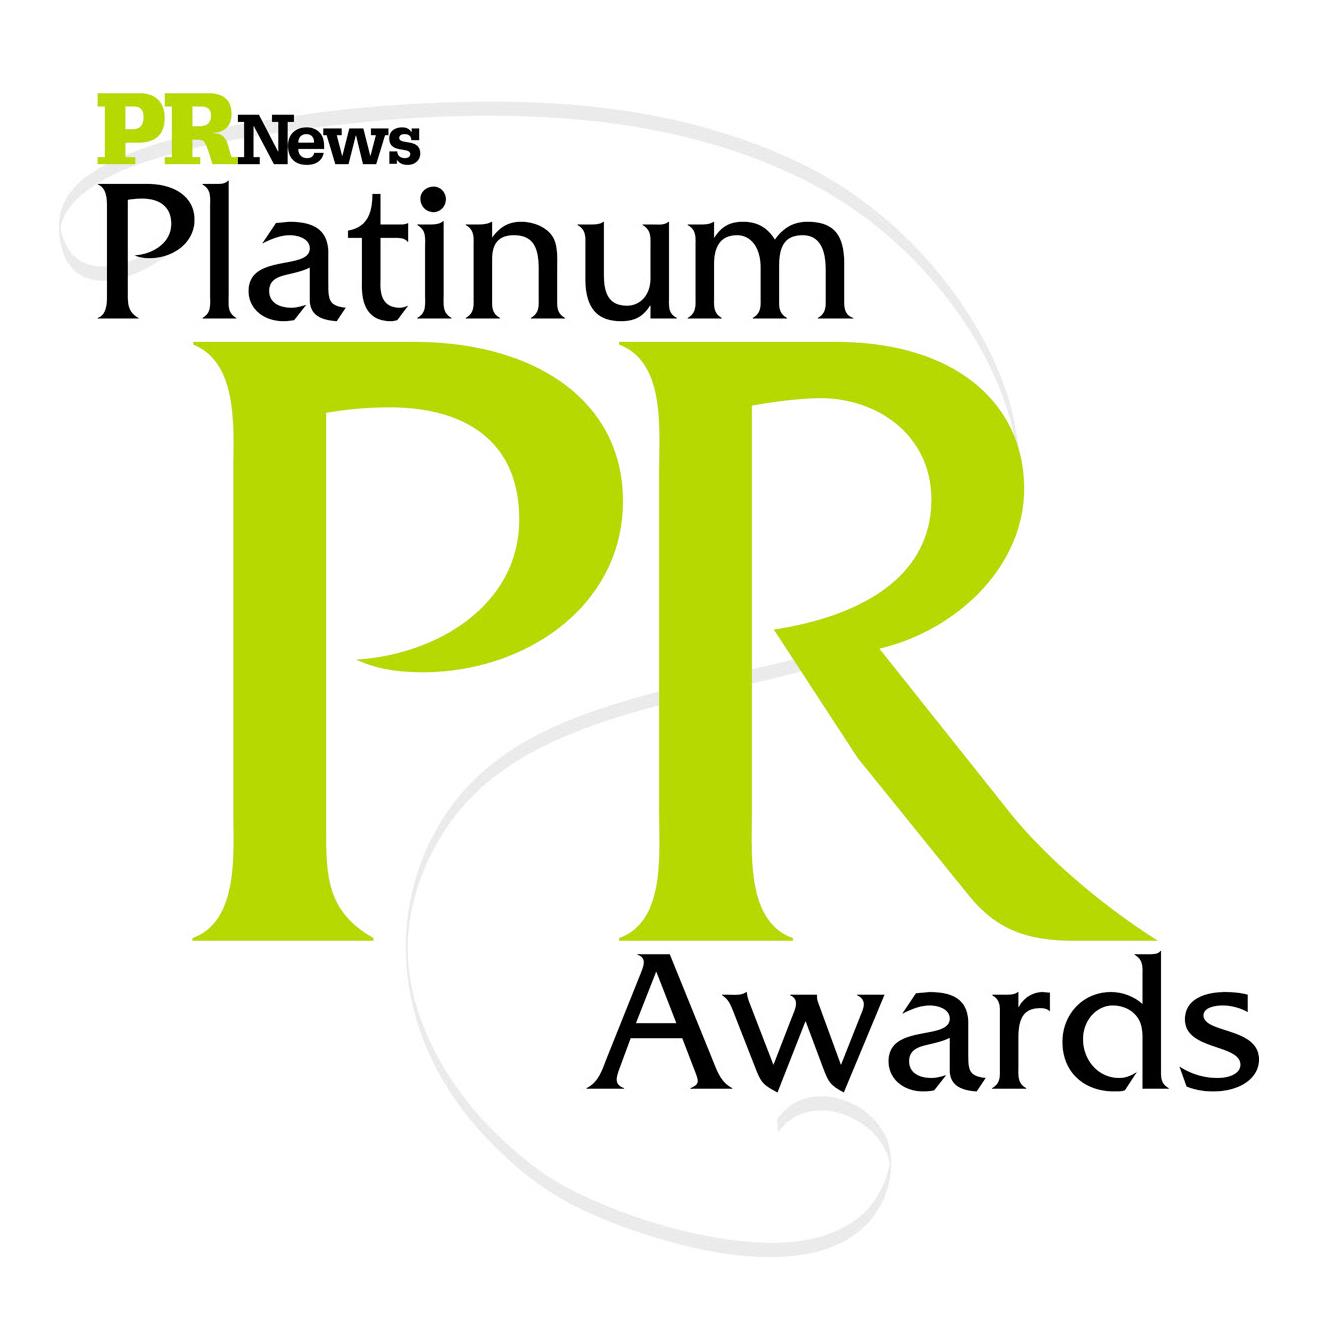 (PR News) Platinum Awards